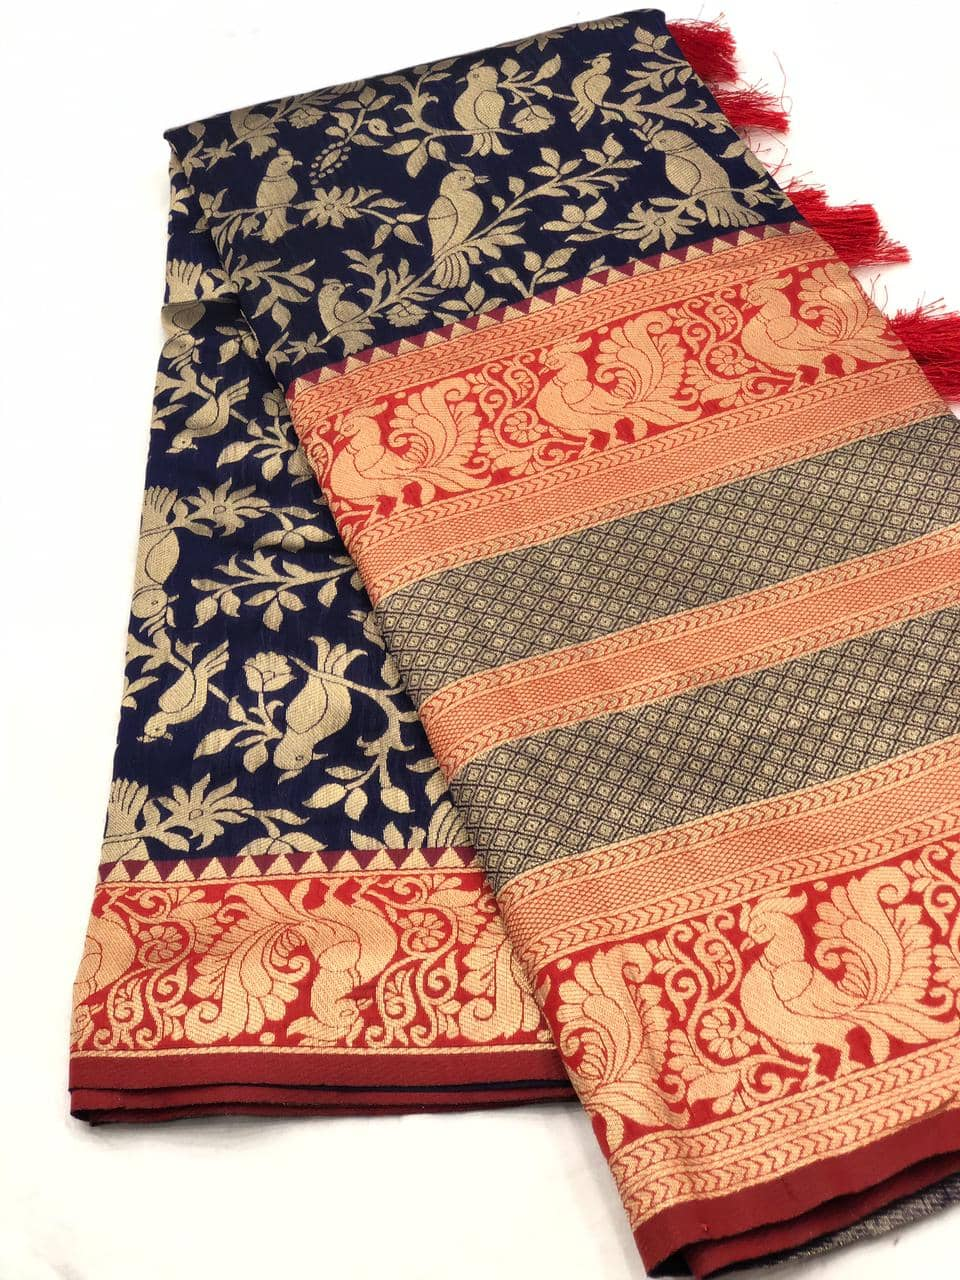 Stunning Kanchipuram Silk Traditional Saree in Blue dvz0001749